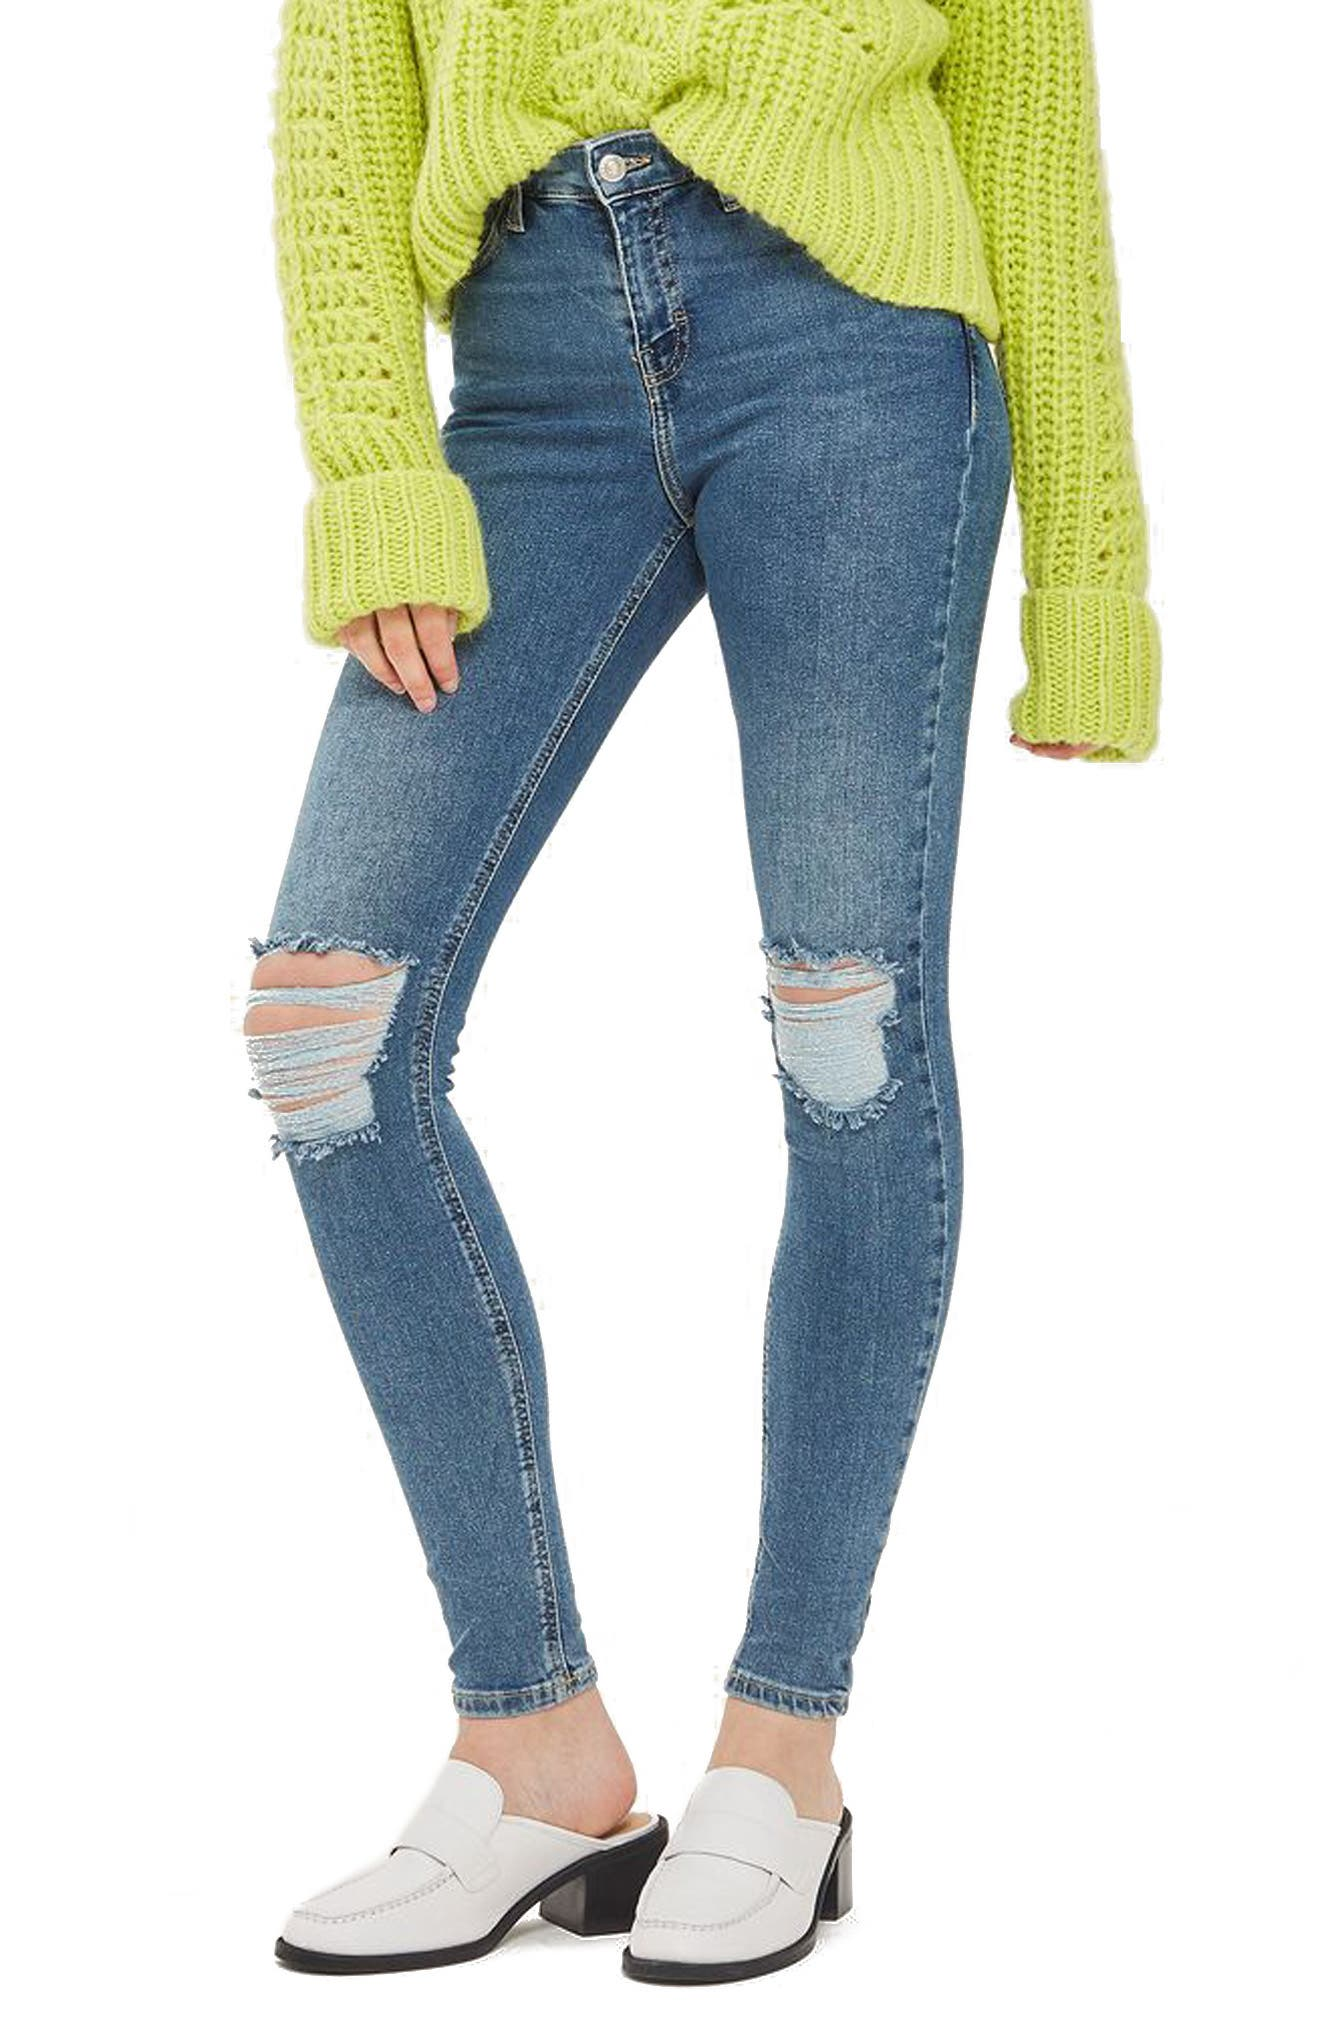 Jamie Rip High Waist Skinny Jeans,                         Main,                         color, Mid Denim